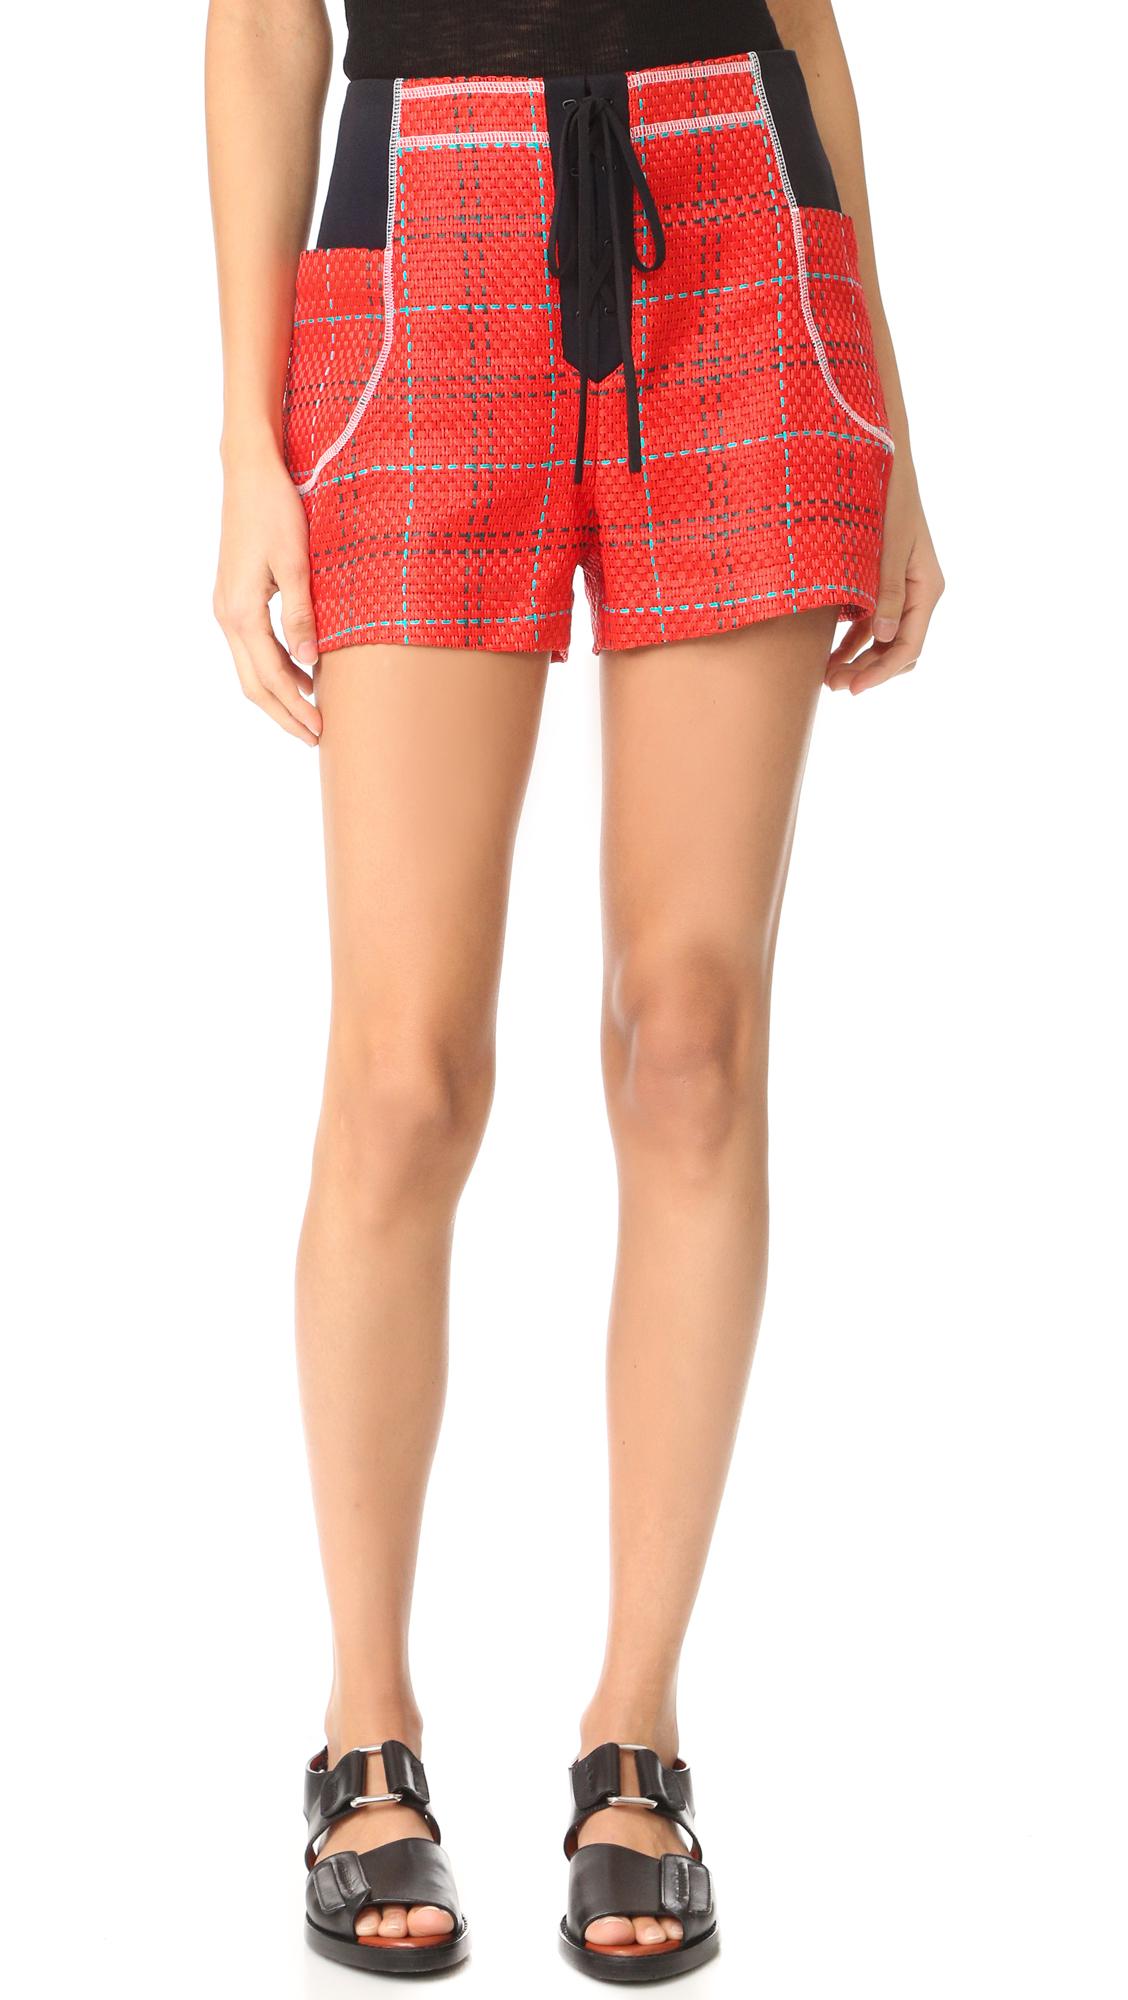 31 phillip lim female 31 phillip lim shorts with front tie poppy